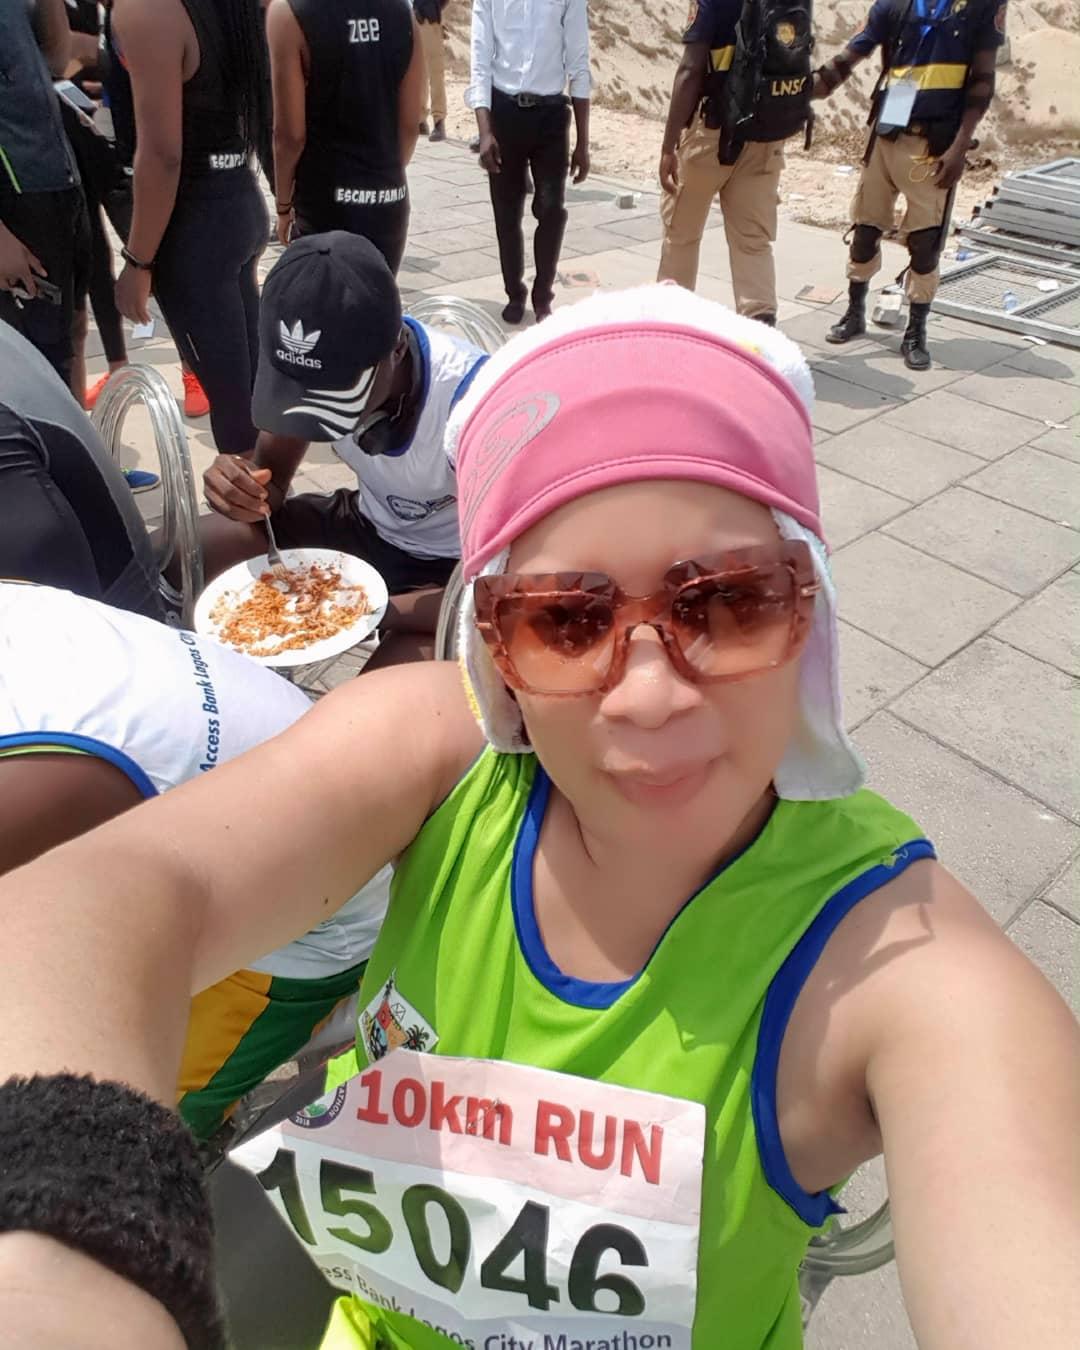 Tiwa Savage Pictured With Monalisa Chinda's Daughter At The Lagos Marathon 2018 (2)